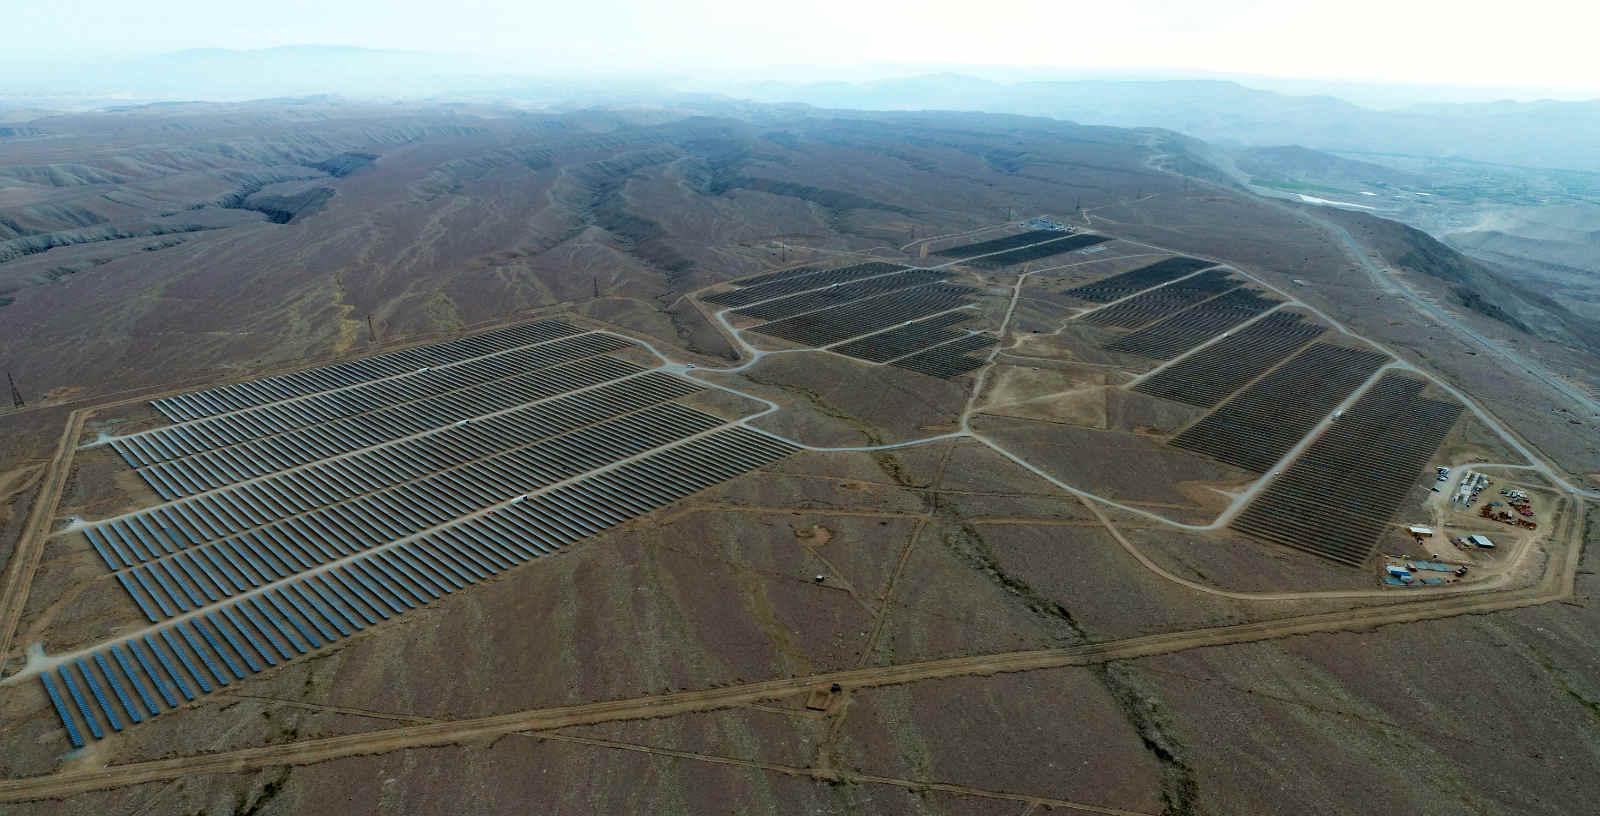 Intipampa_PV_Photovoltaic_Plant_Per__Engie_IDOM_2